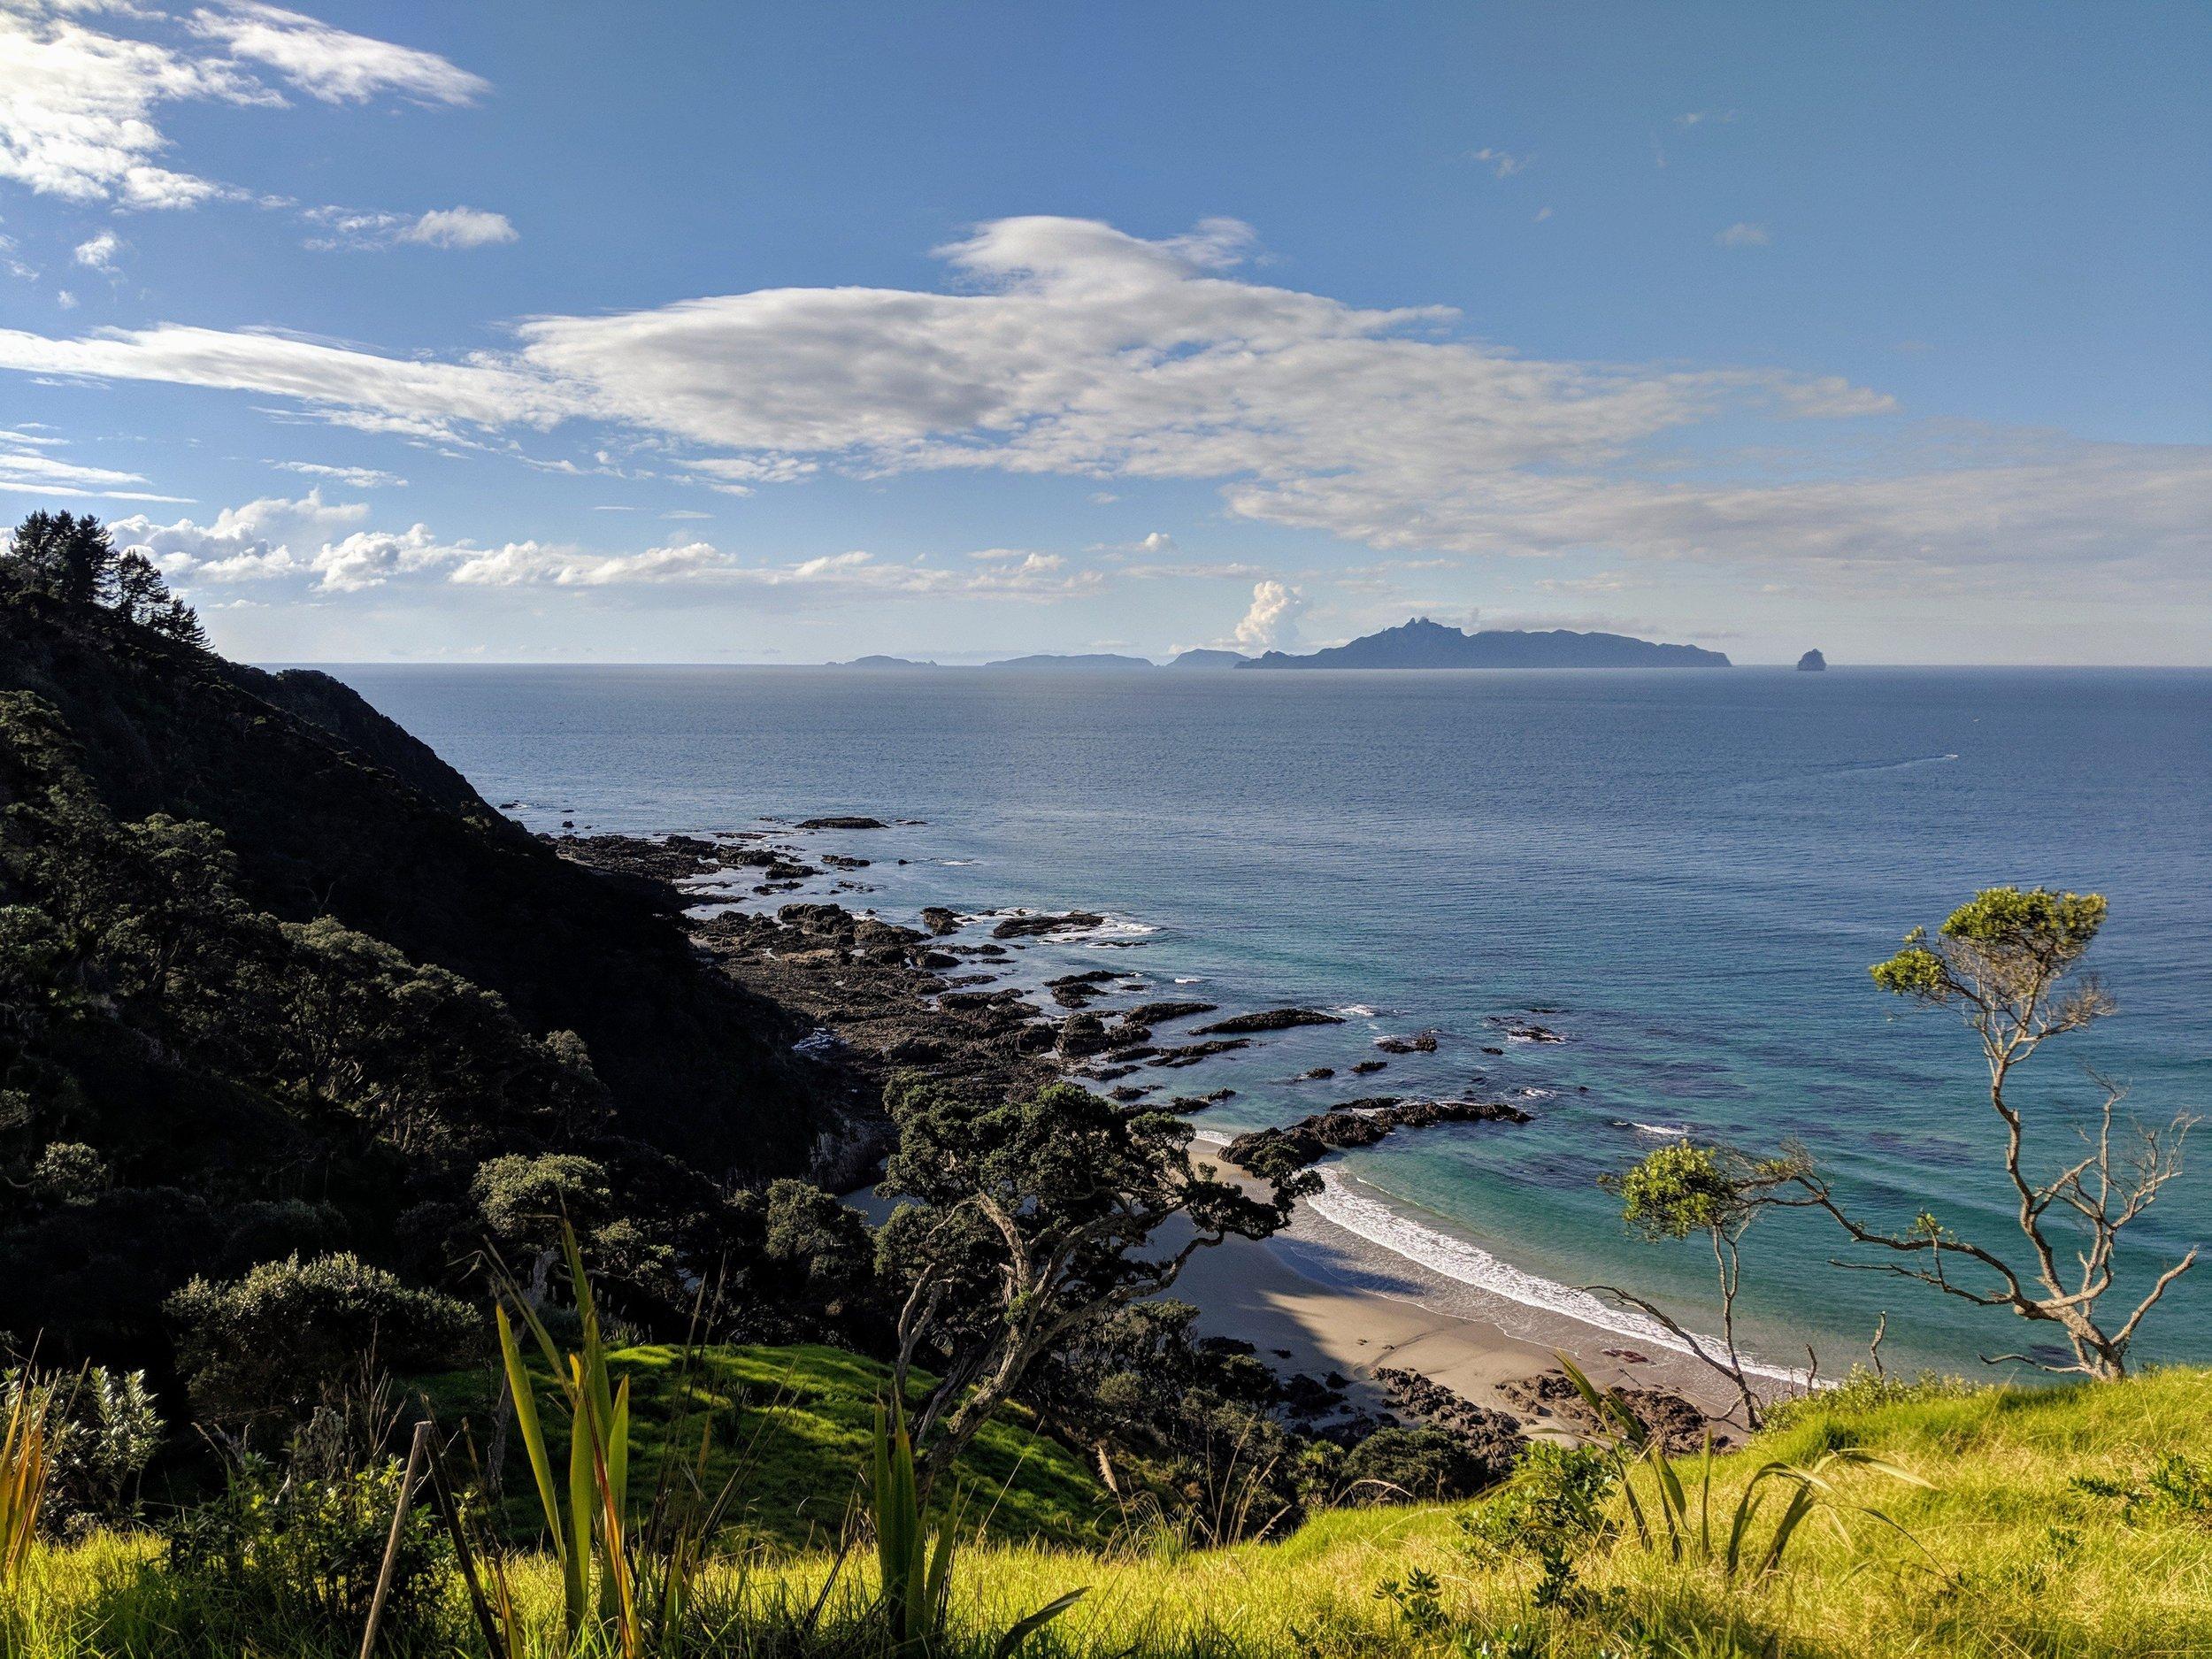 mangawhai-cliff-walk-northland-new-zealand-oc-4032x3024.jpg